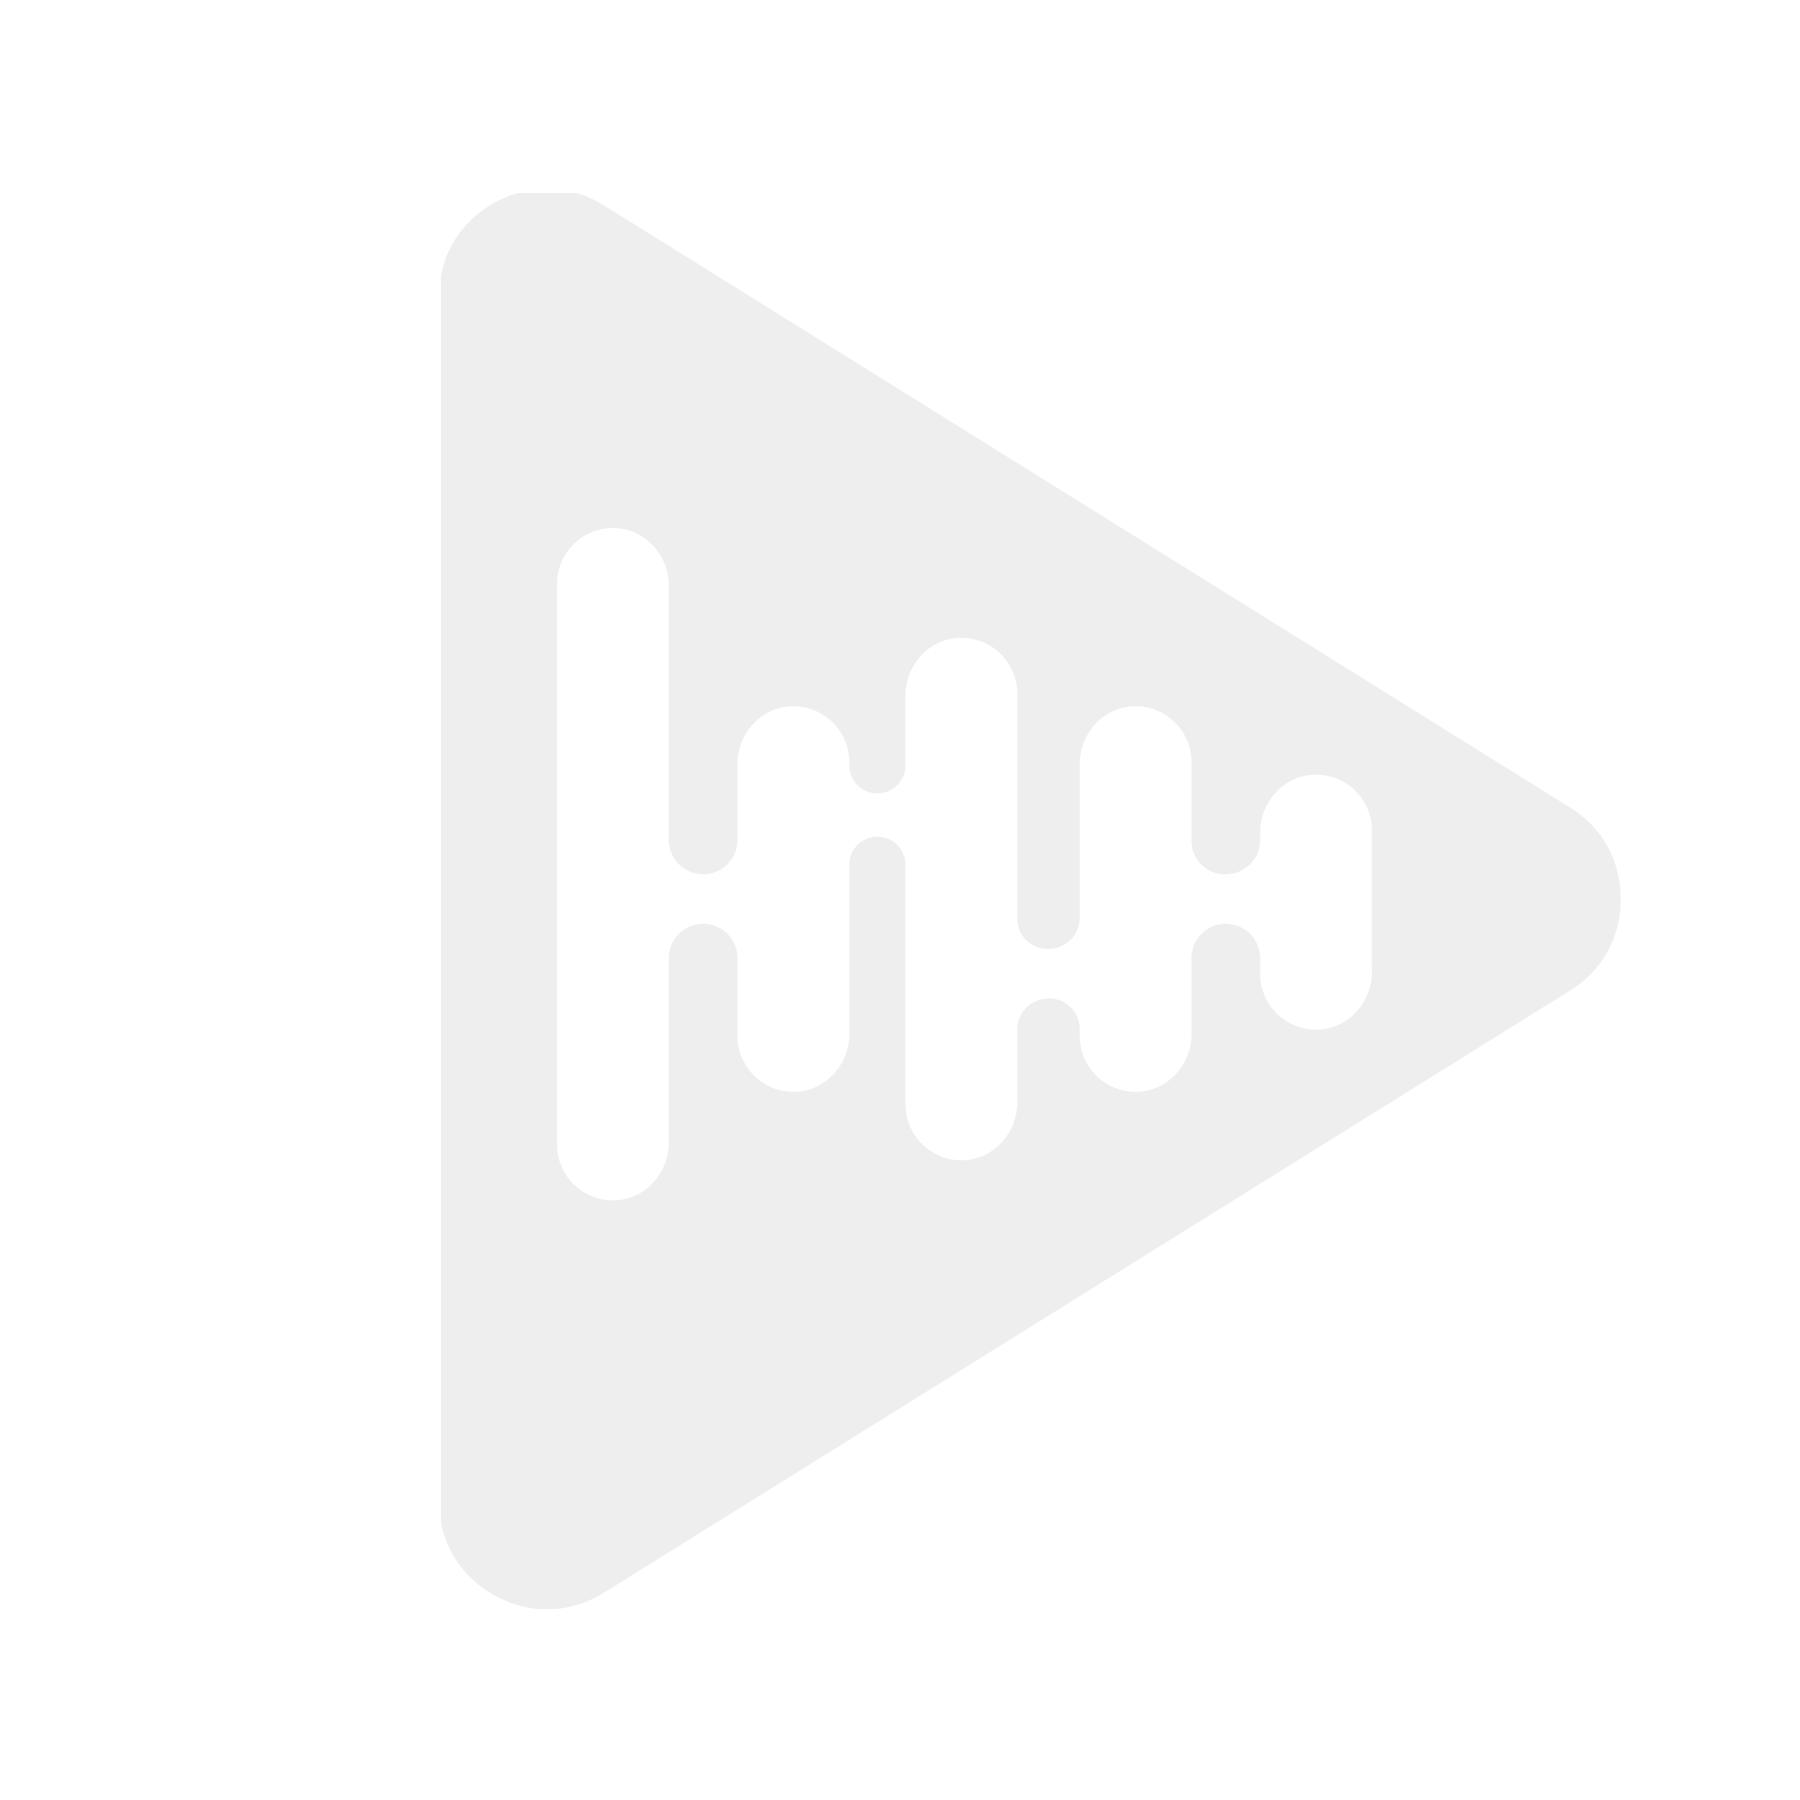 Phonocar VM251 - Signalforsterker/switch for video